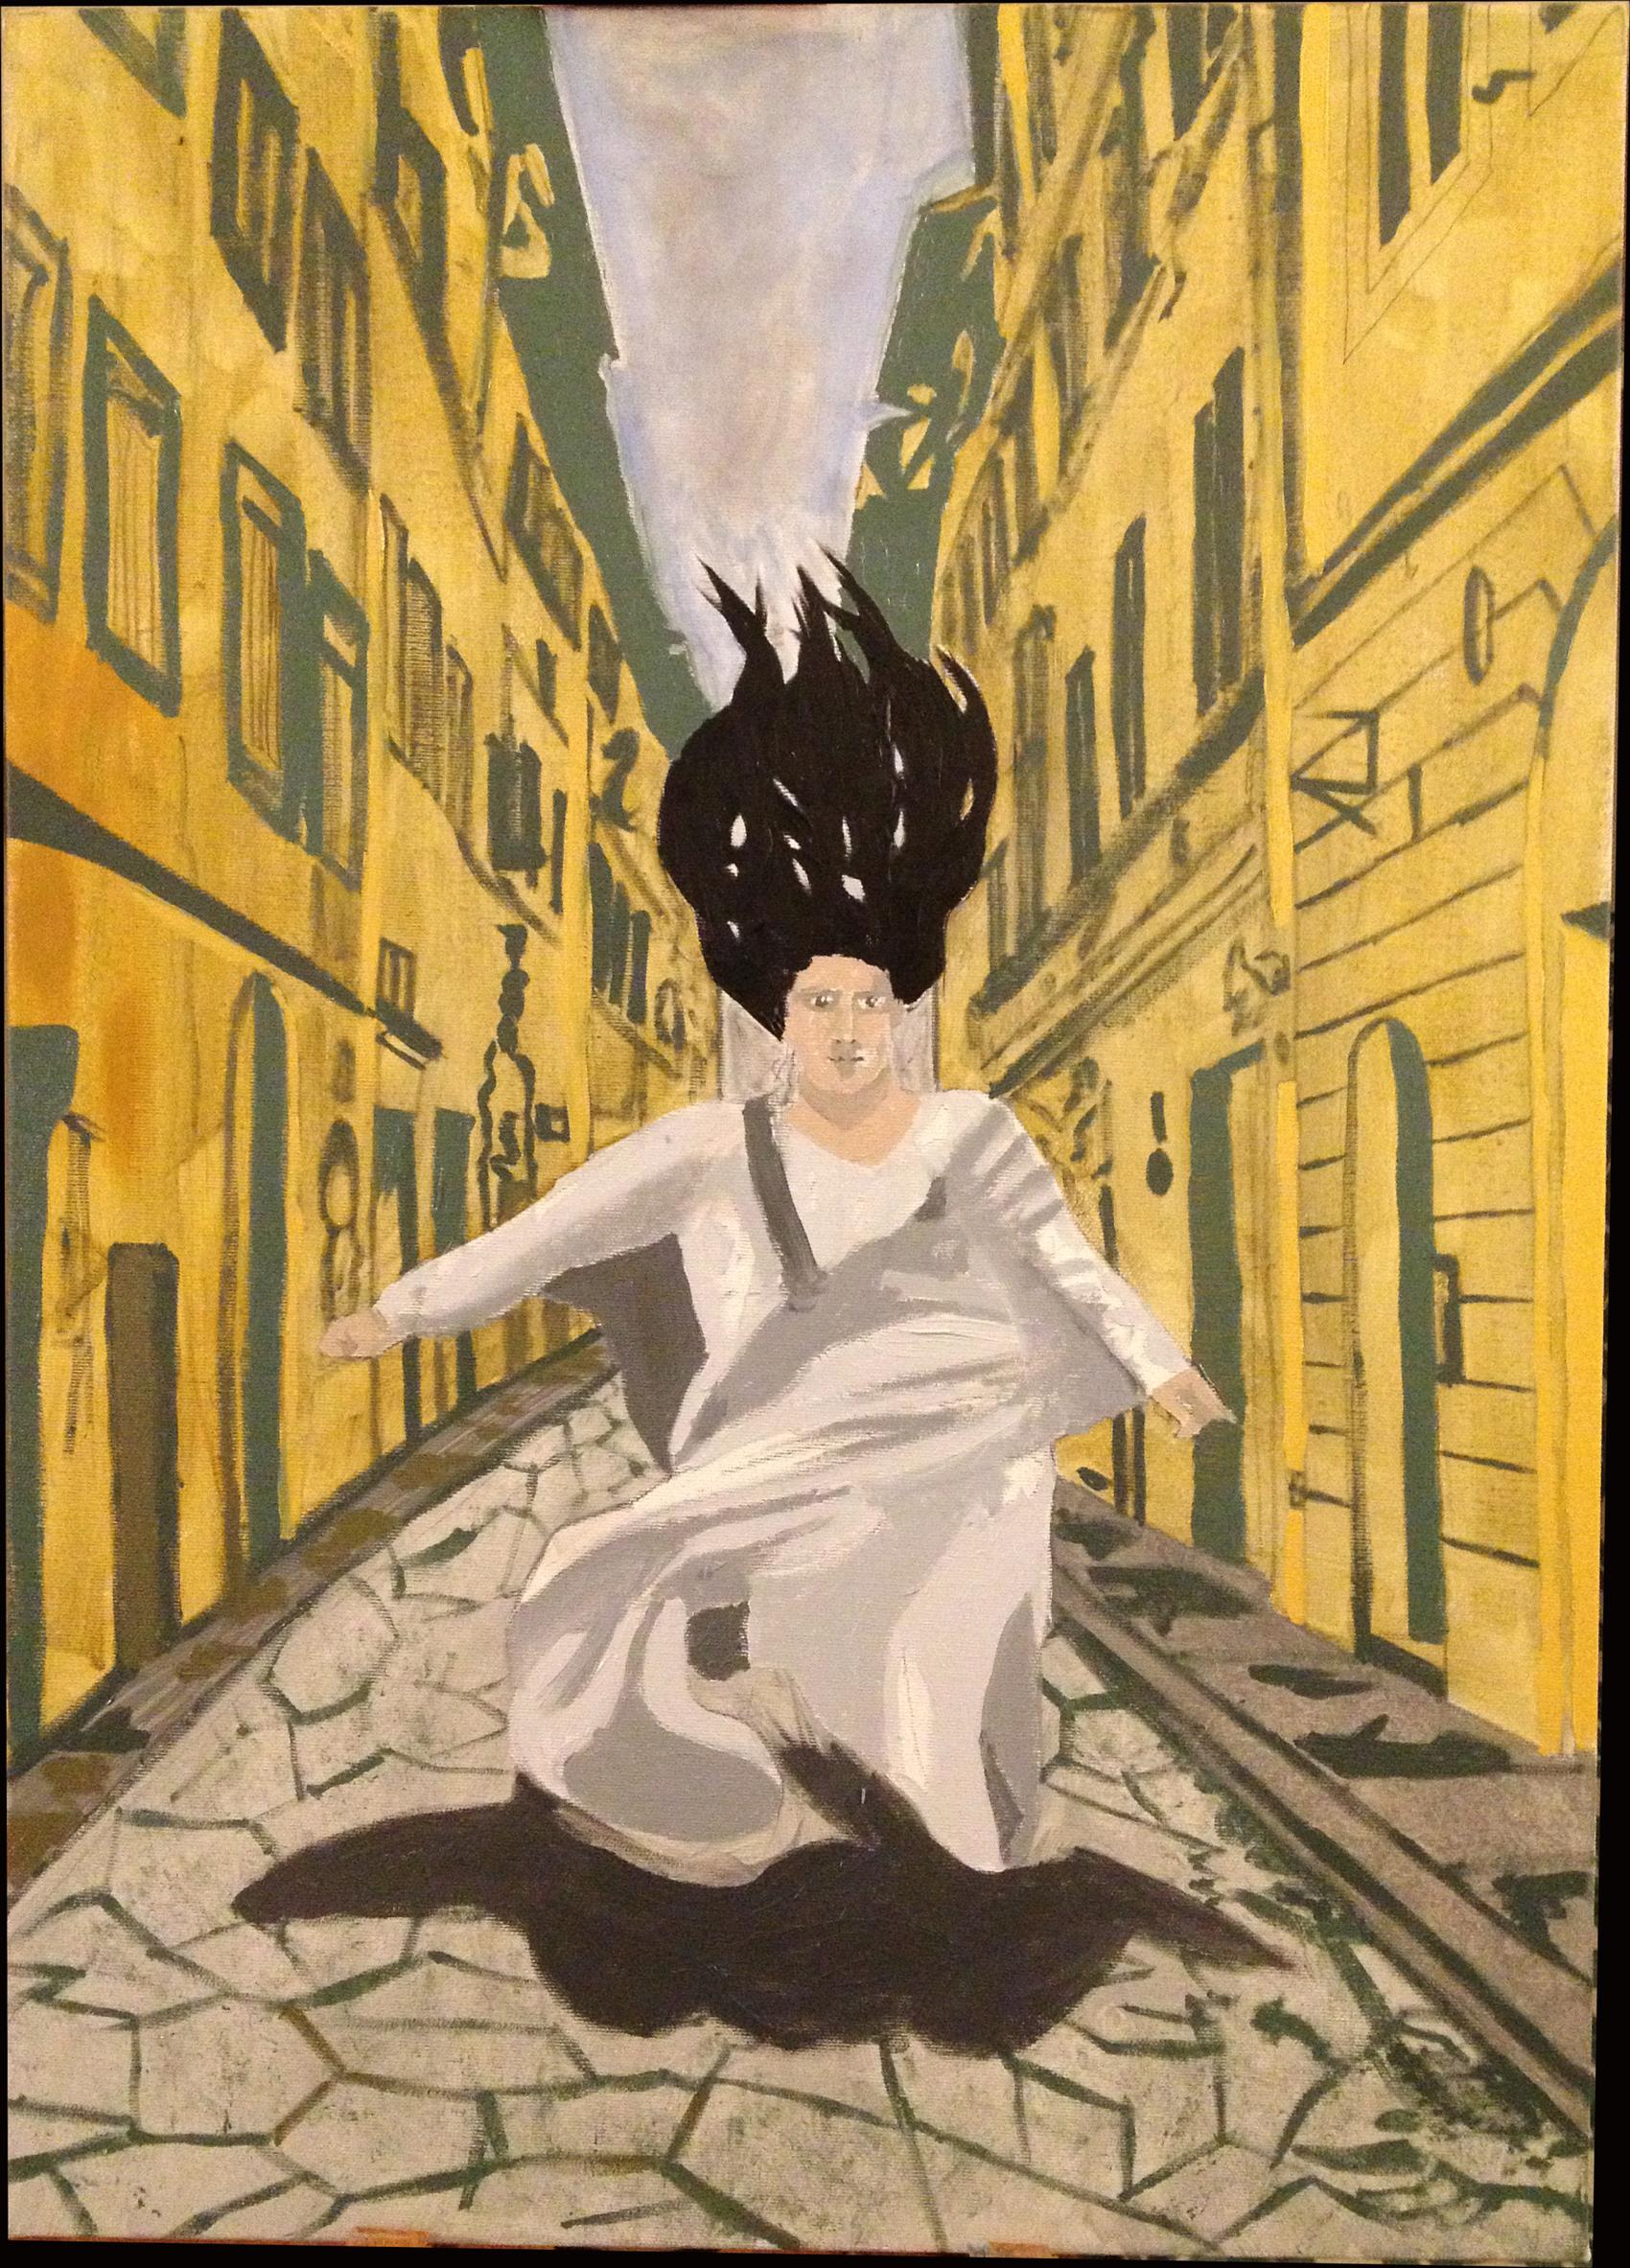 Jesse Waugh 5=6 December 31, 2012 Oil on canvas